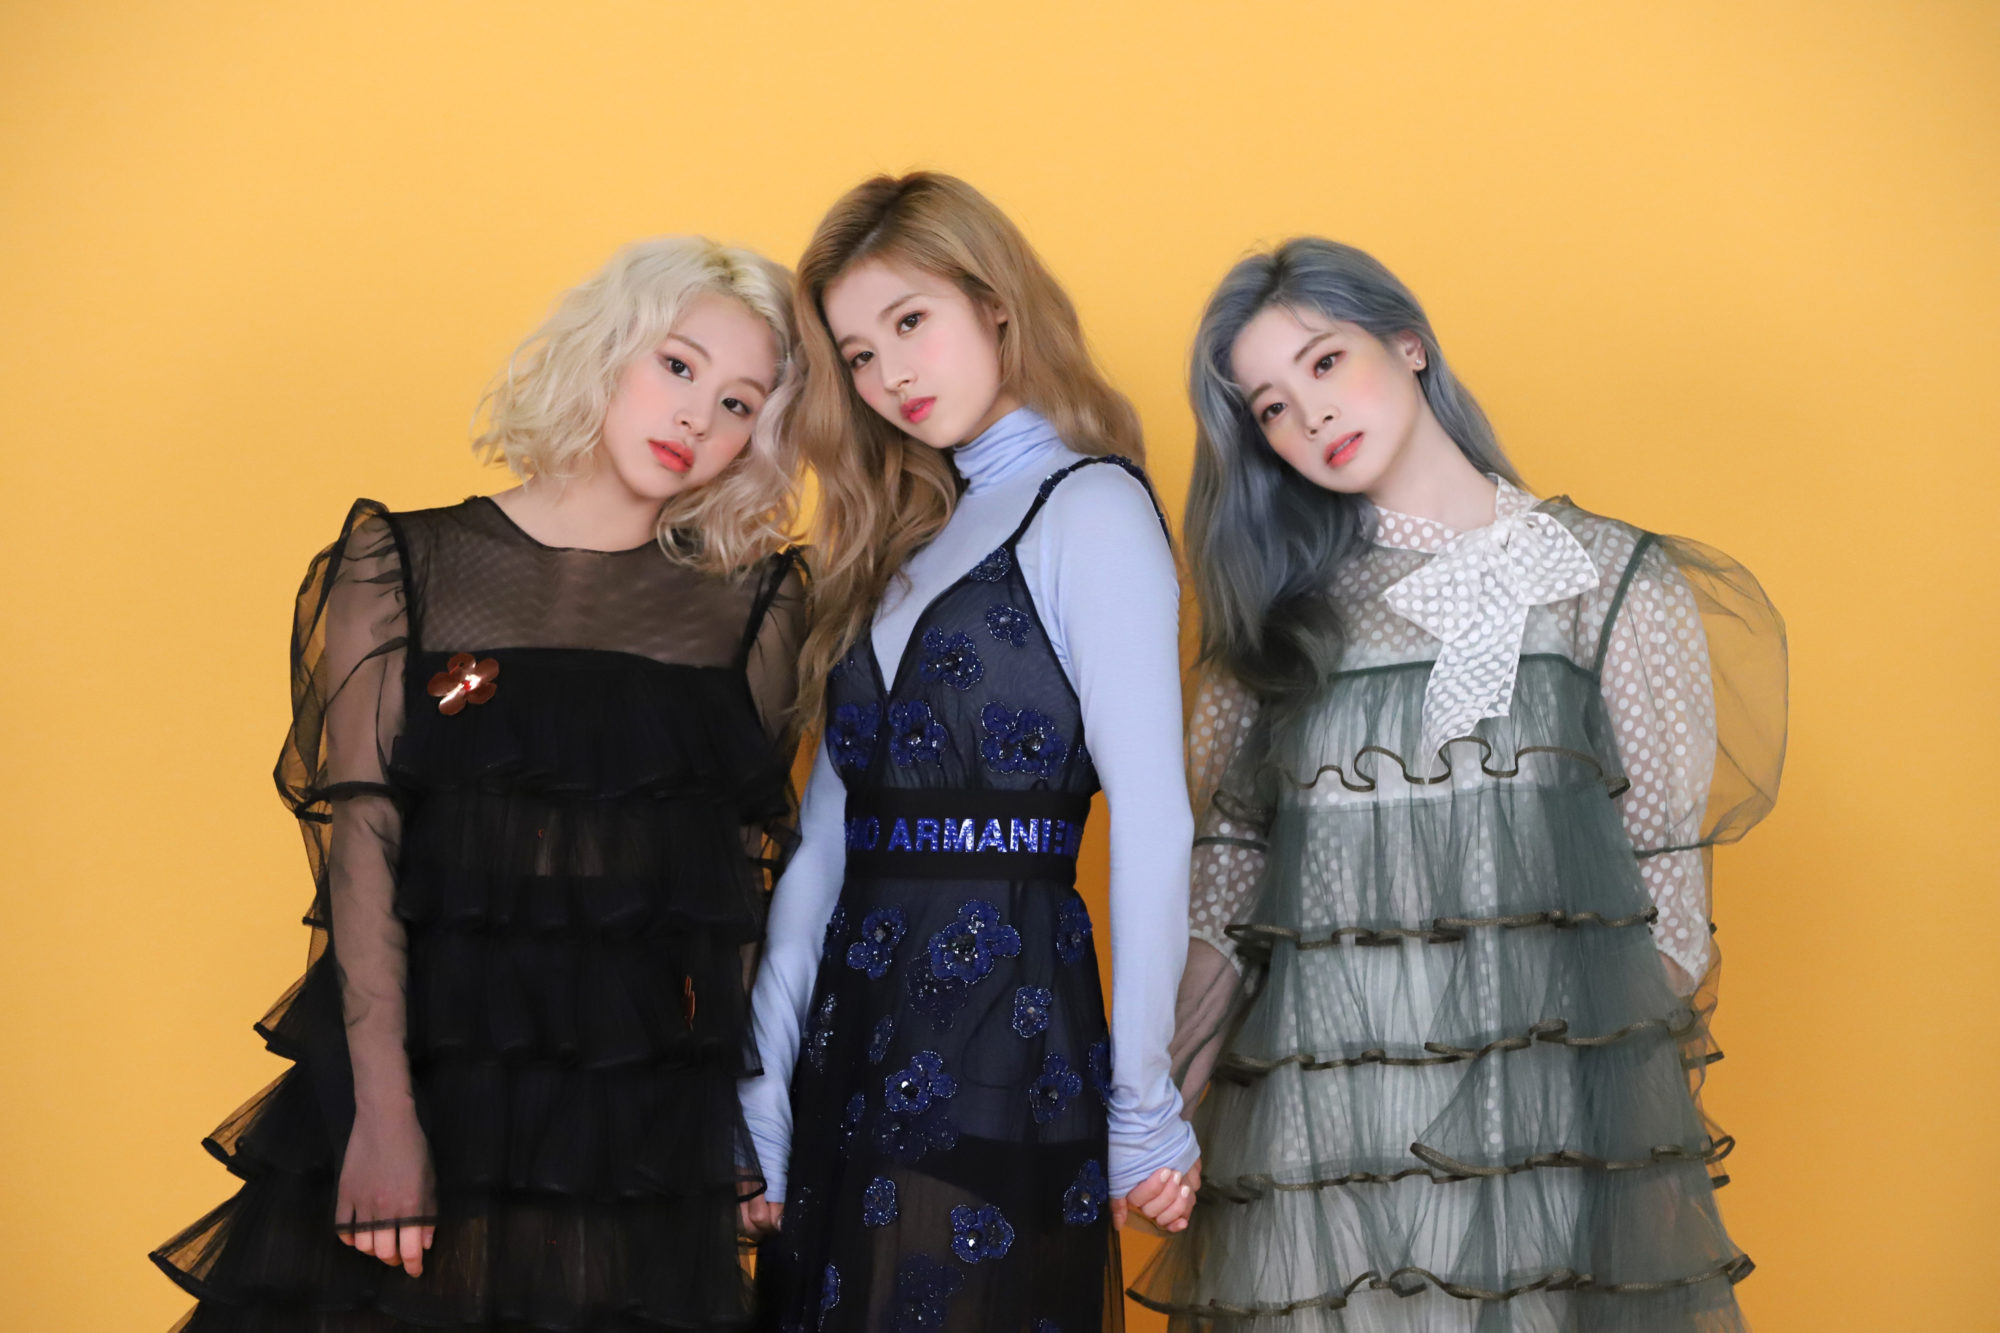 Twice Allure Chaeyoung Sana Dahyun 2019 HD